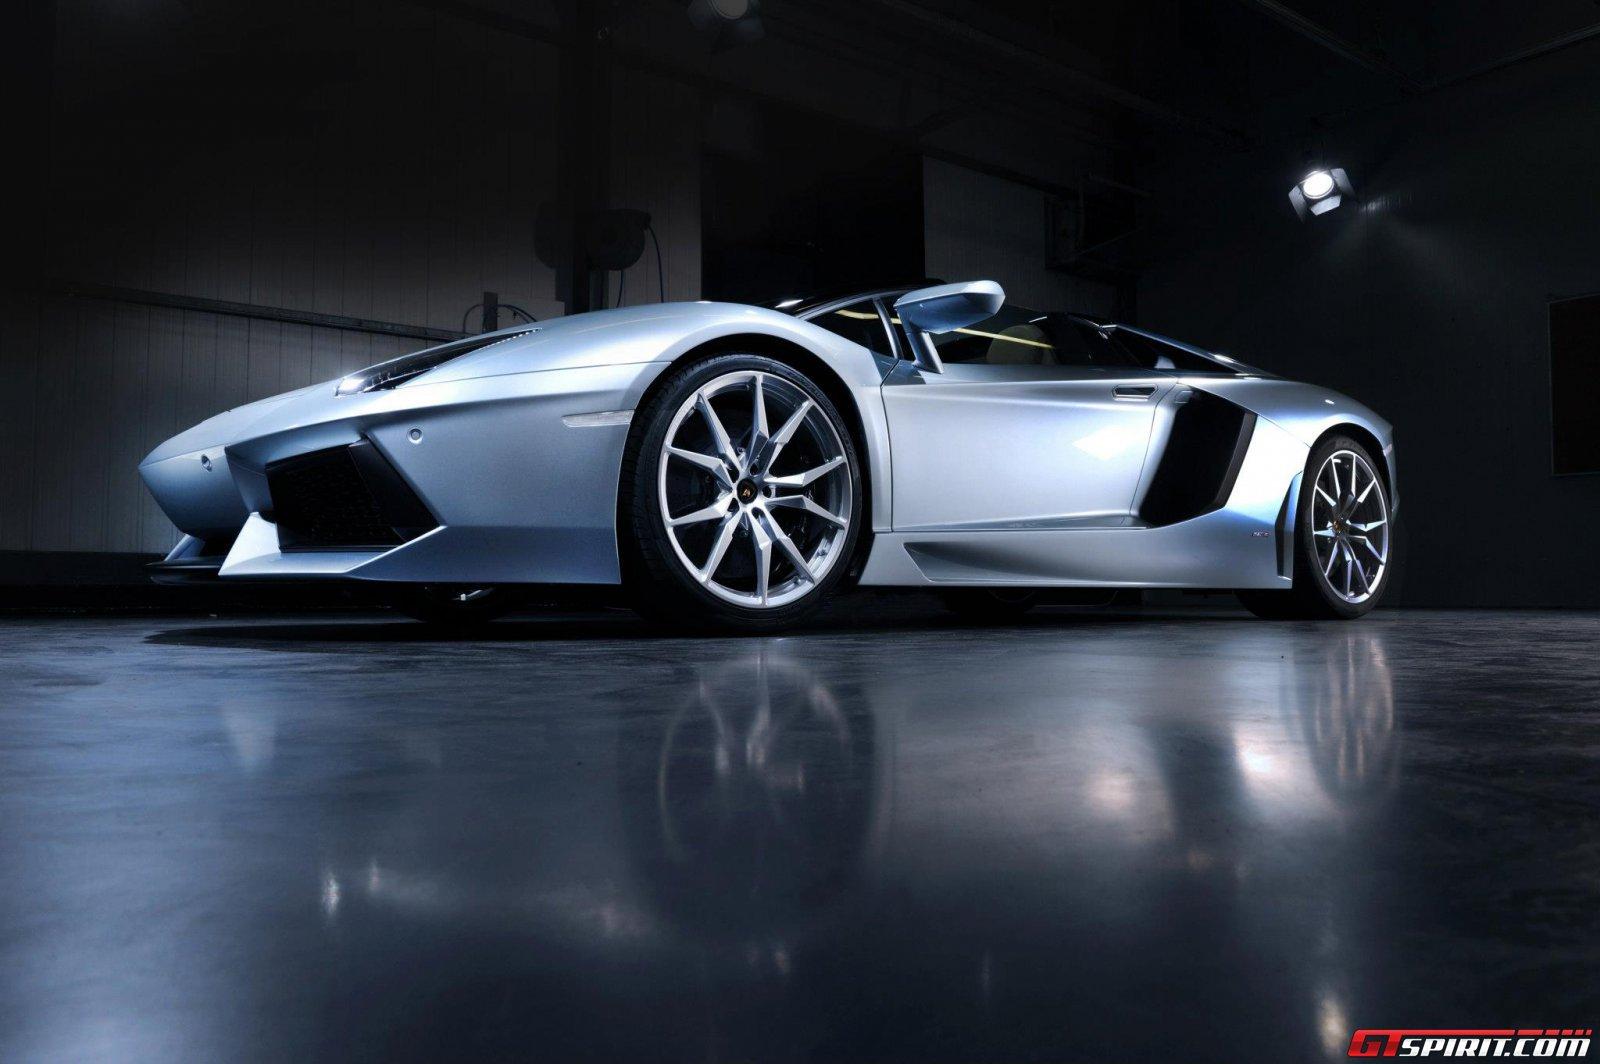 2013 Lamborghini Aventador LP700-4 Roadster Photo 13